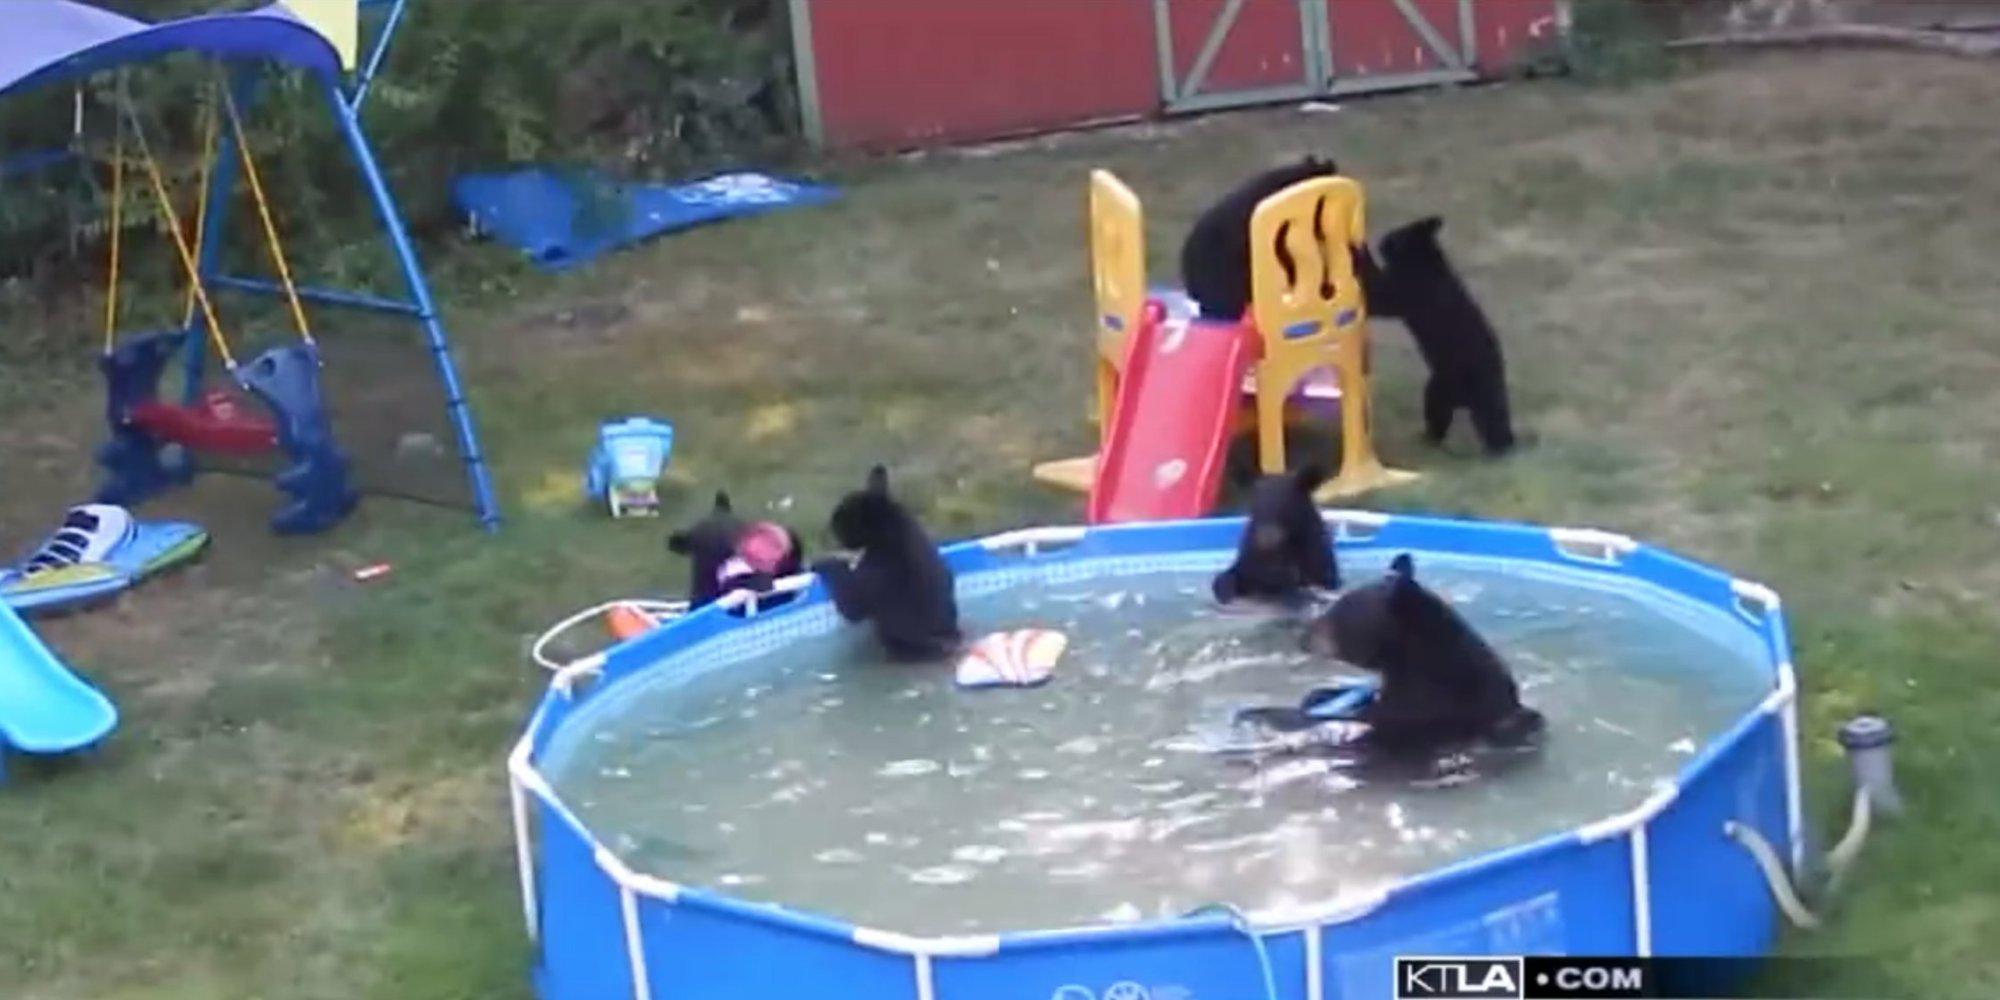 Family of bear cubs break into family 39 s paddling pool for for Family paddling pool